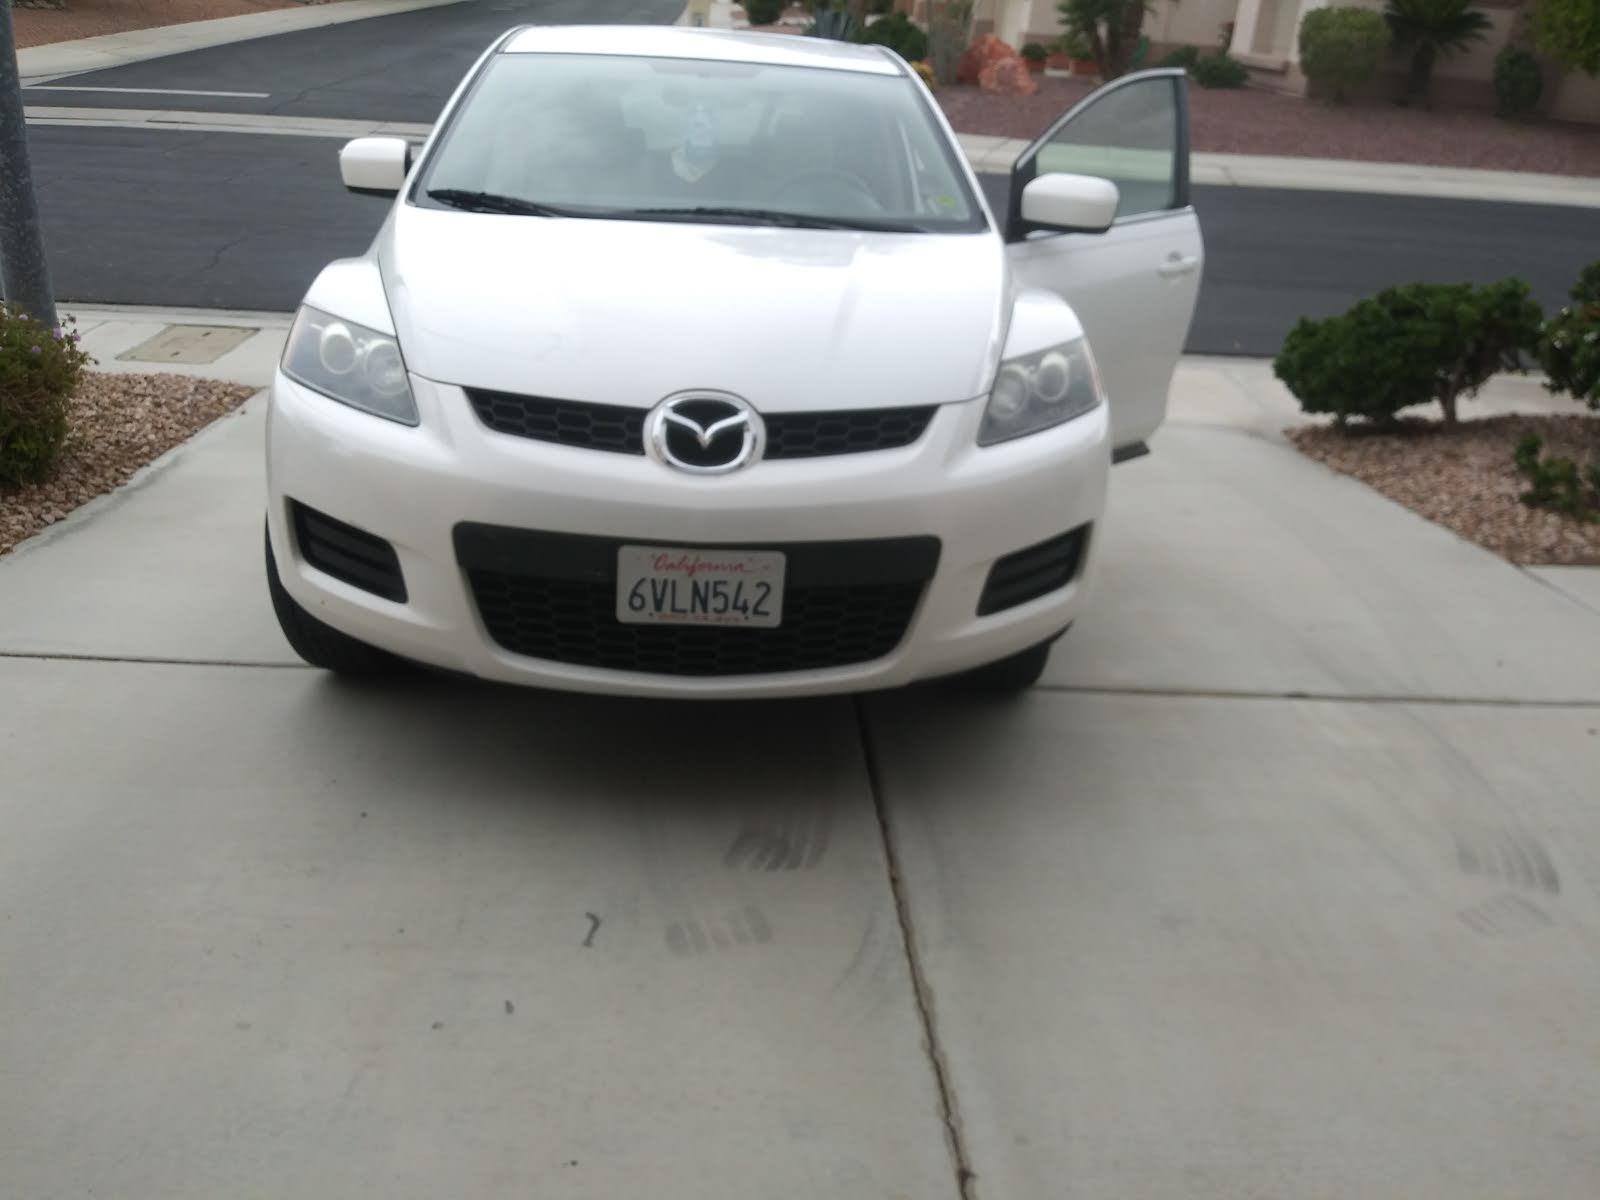 2009 Mazda CX-7 - Overview - CarGurus